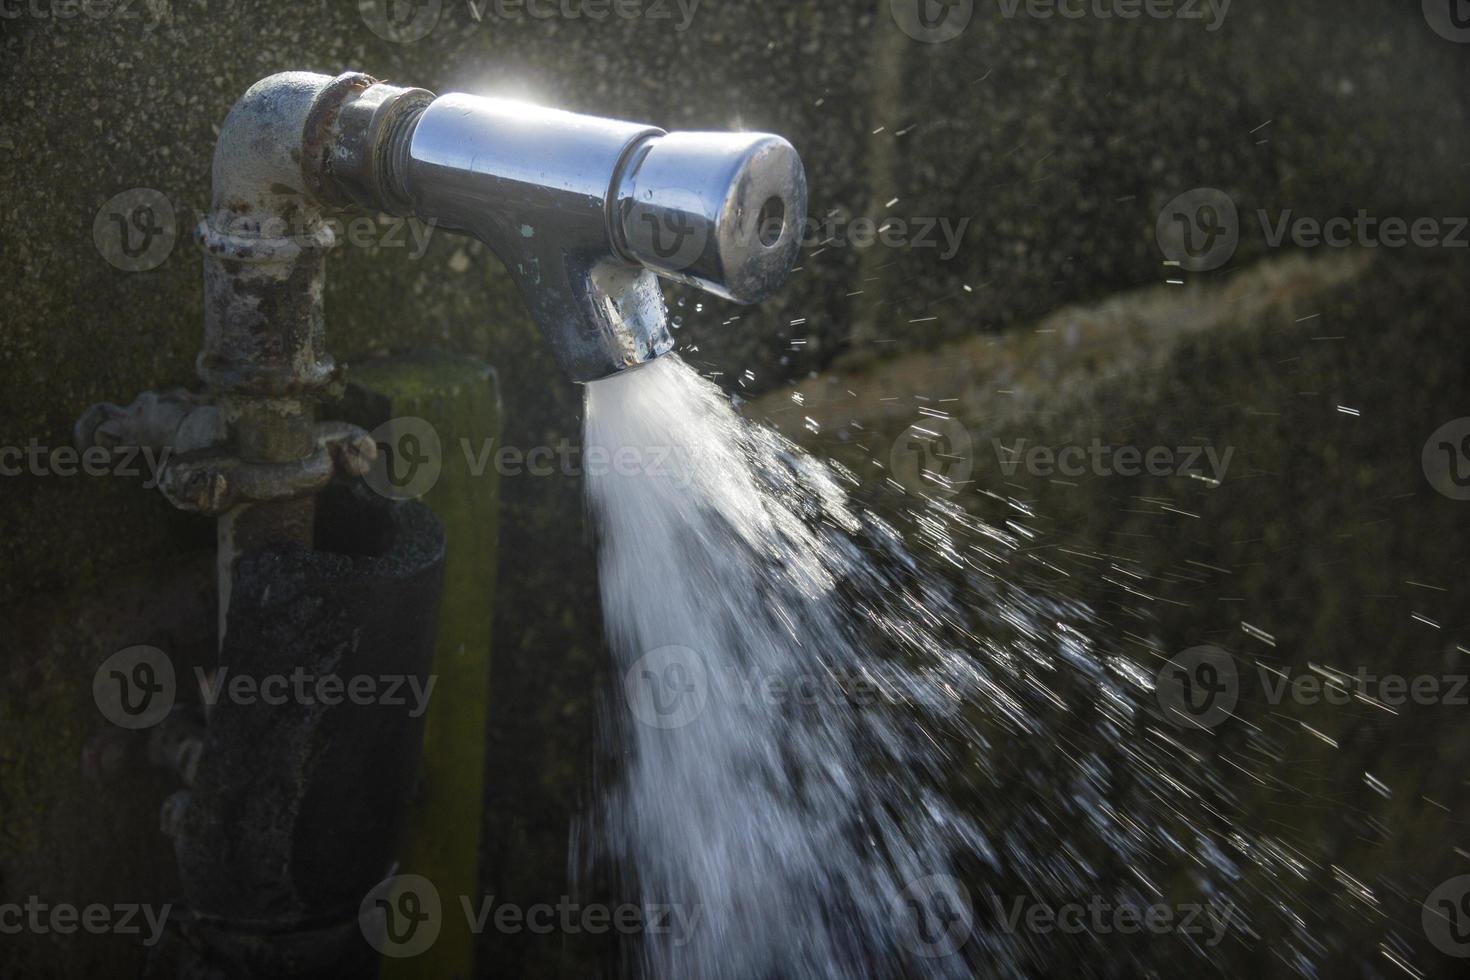 Tap water in sunlight photo